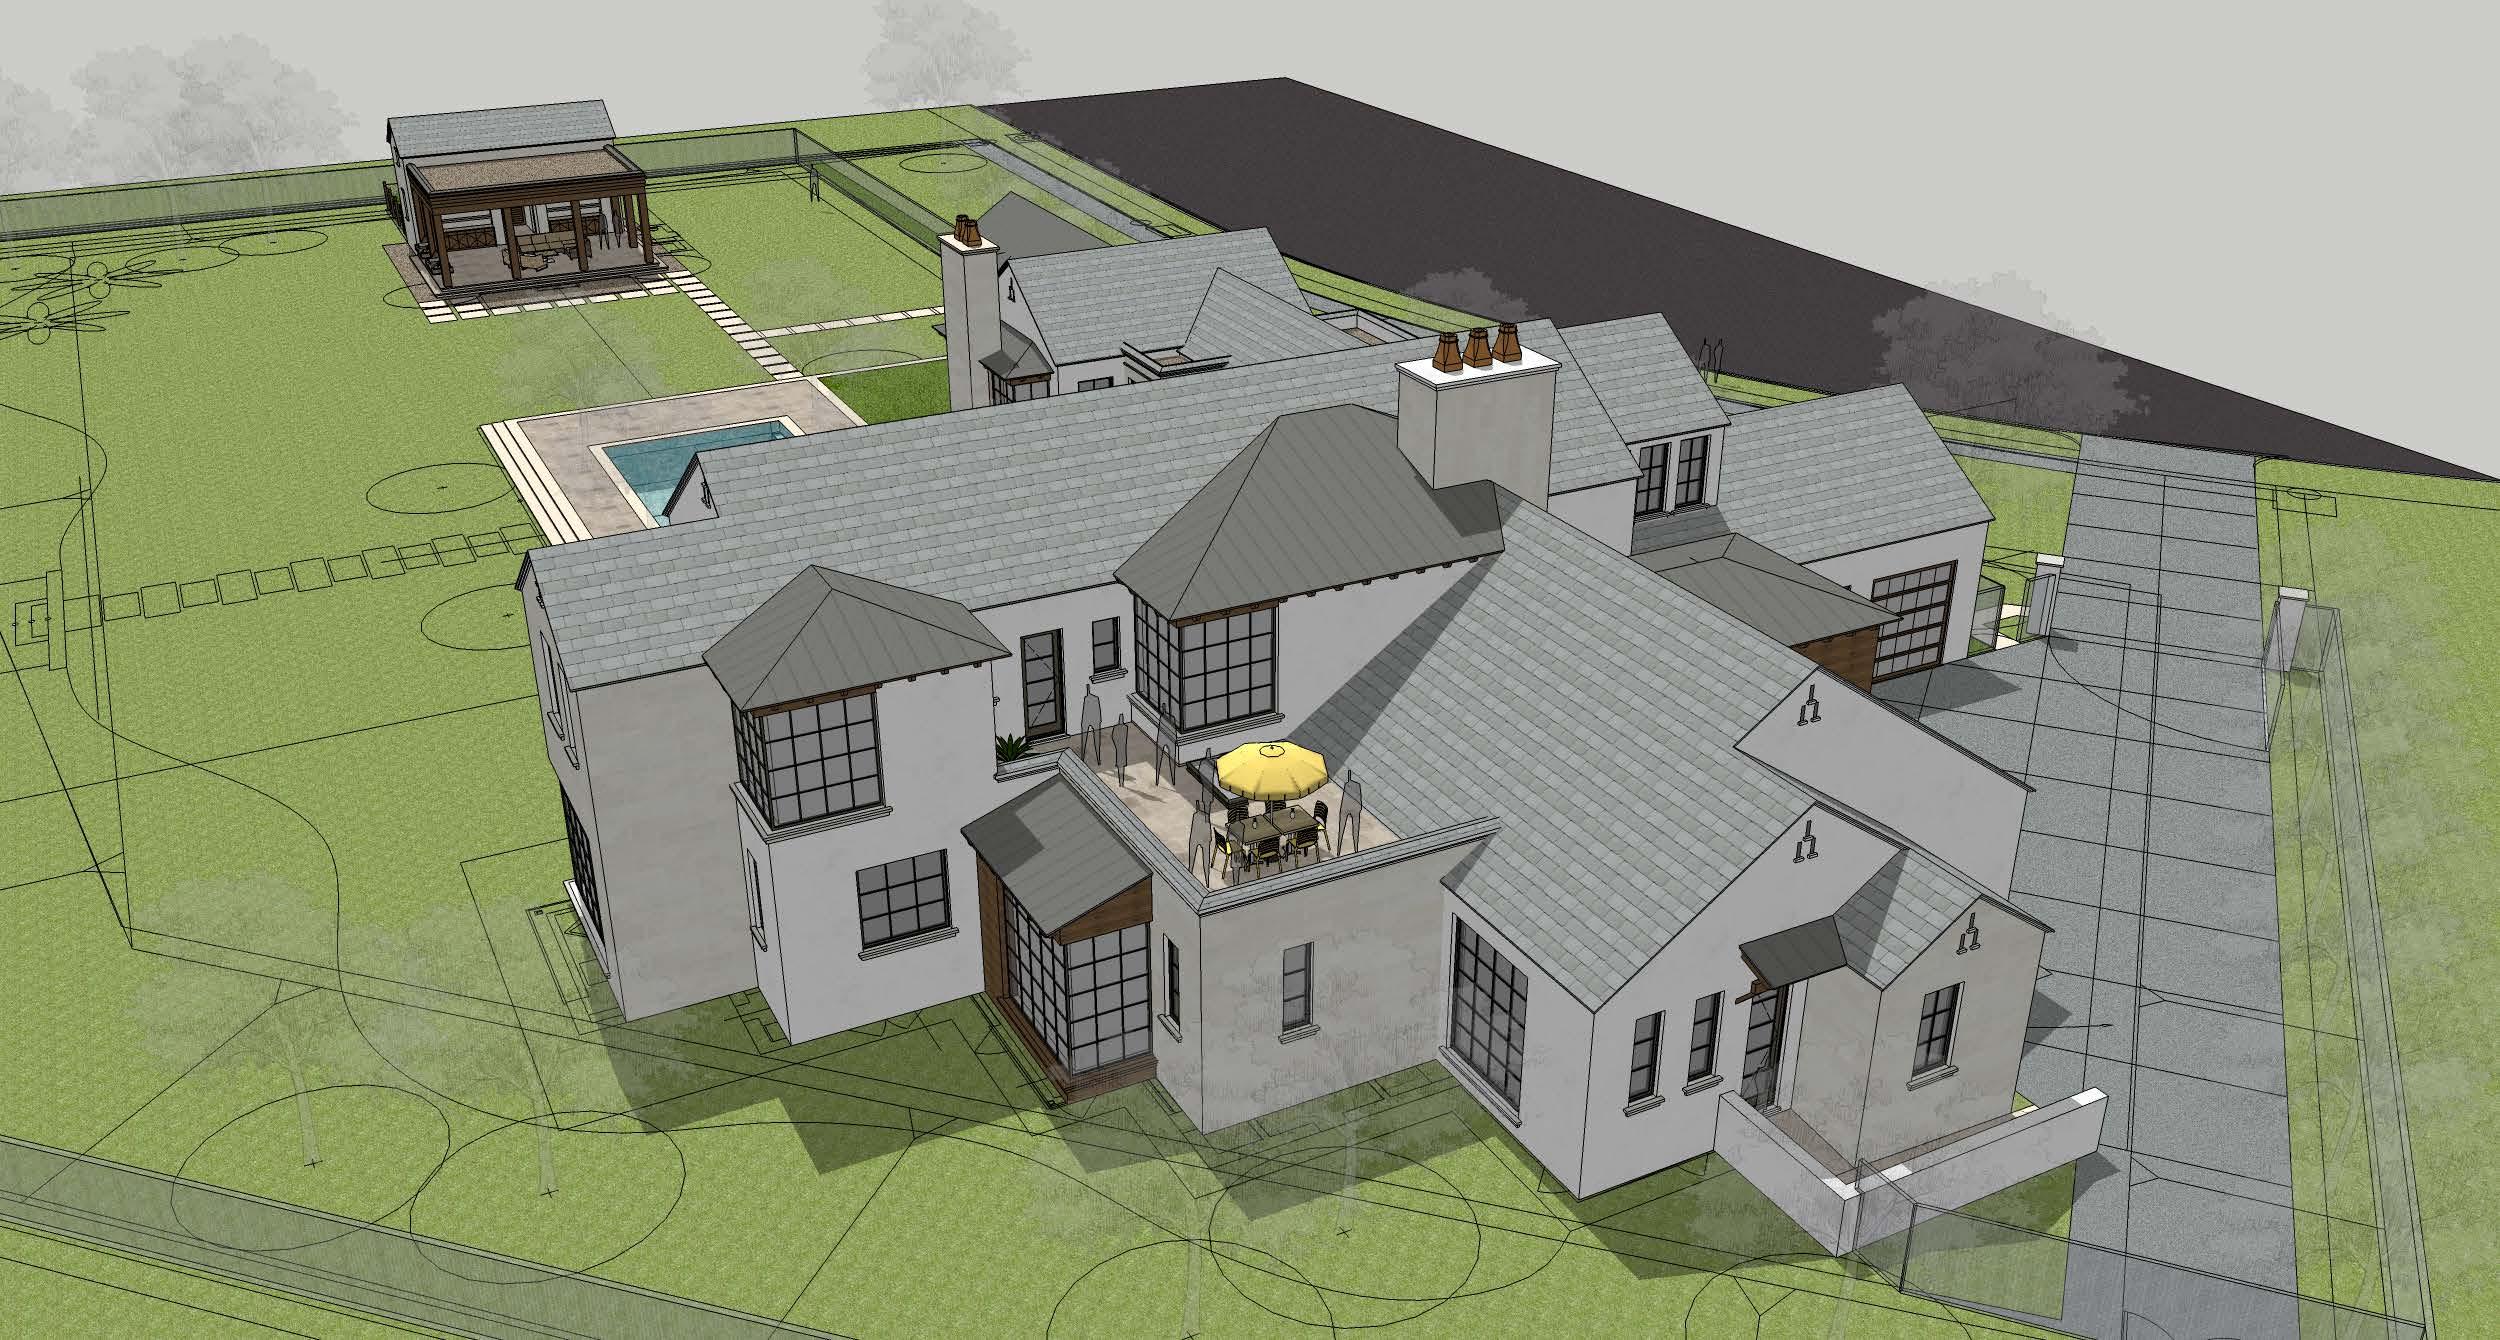 17-080_Vyas Residence_Model Views_Design Review_Page_3.jpg